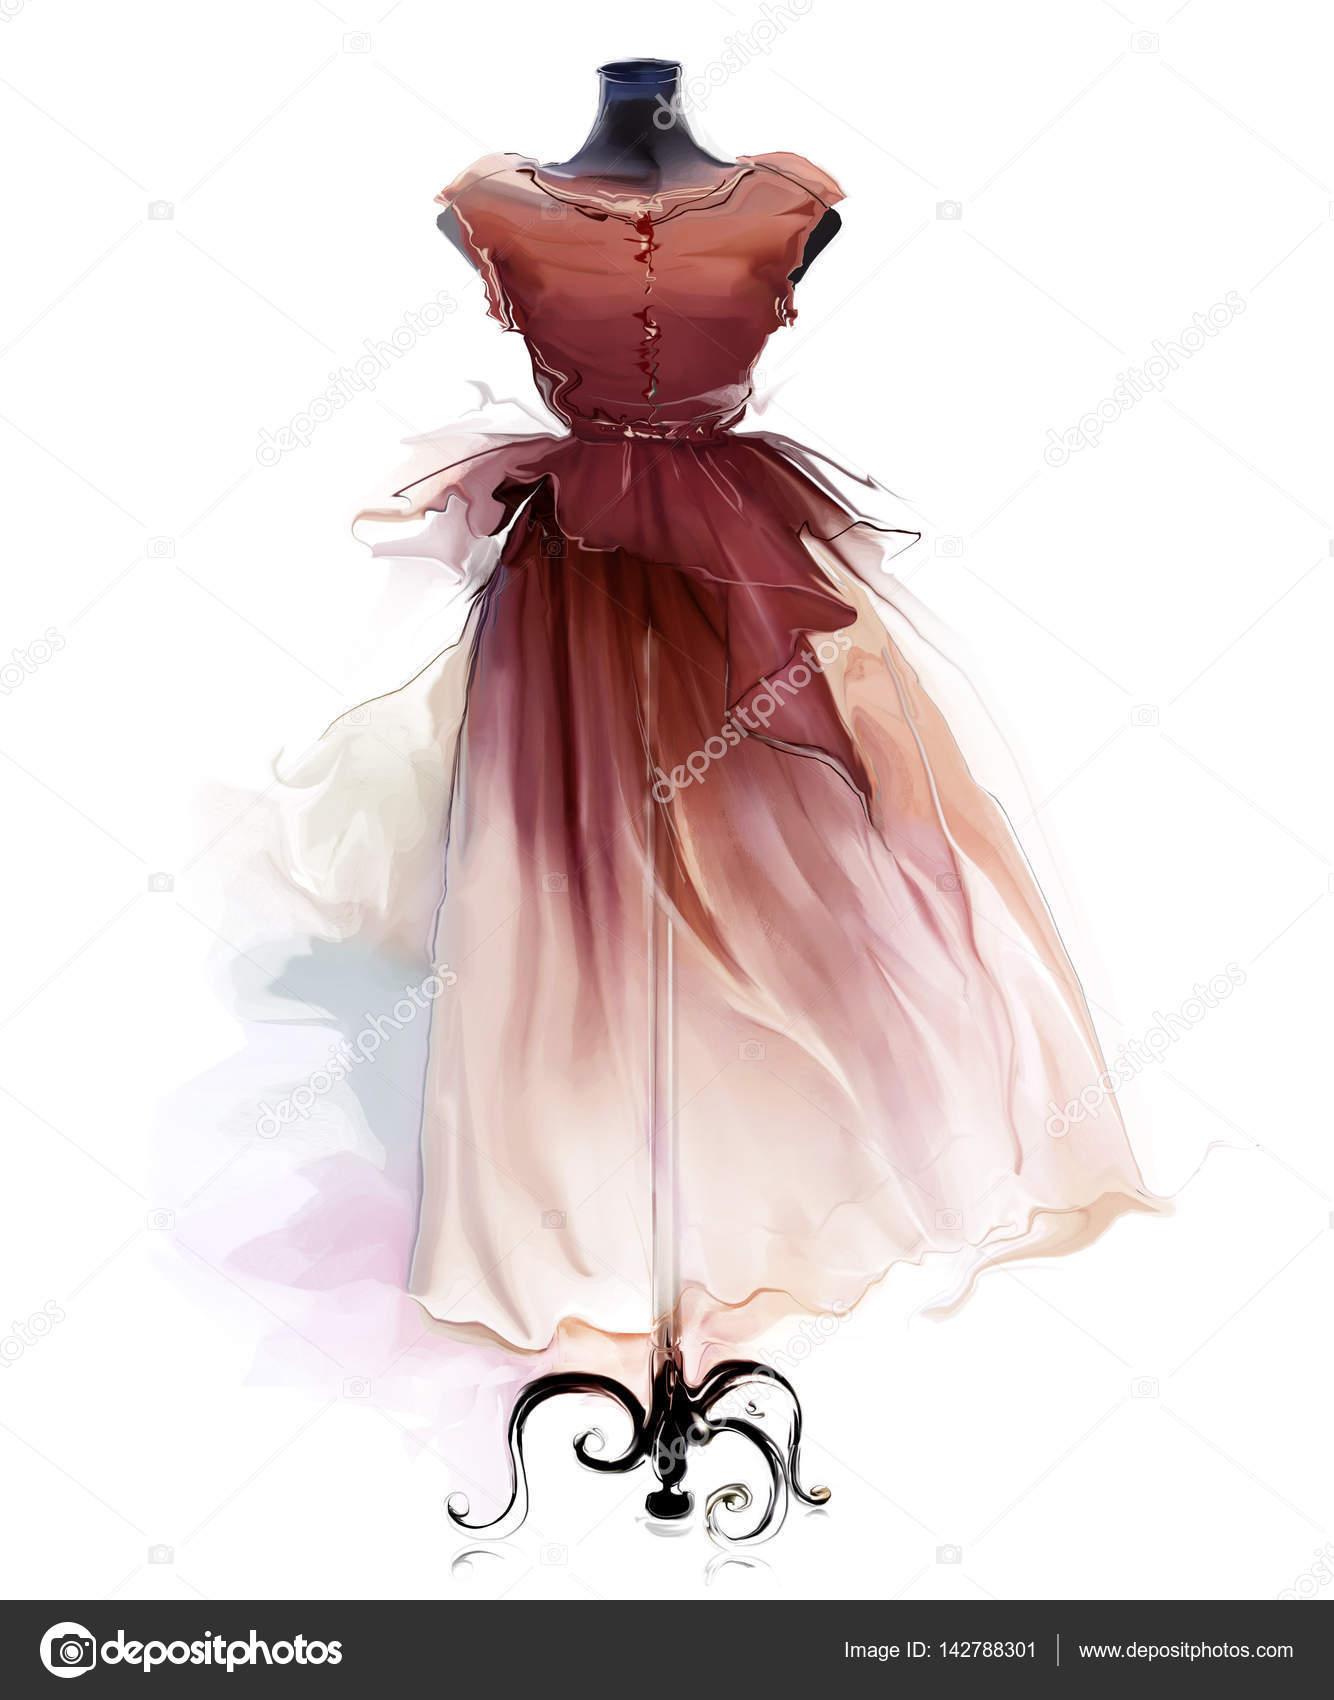 aa0bacec23dbd güzel bir Retro elbise çizimi — Stok Foto © Teniteni #142788301